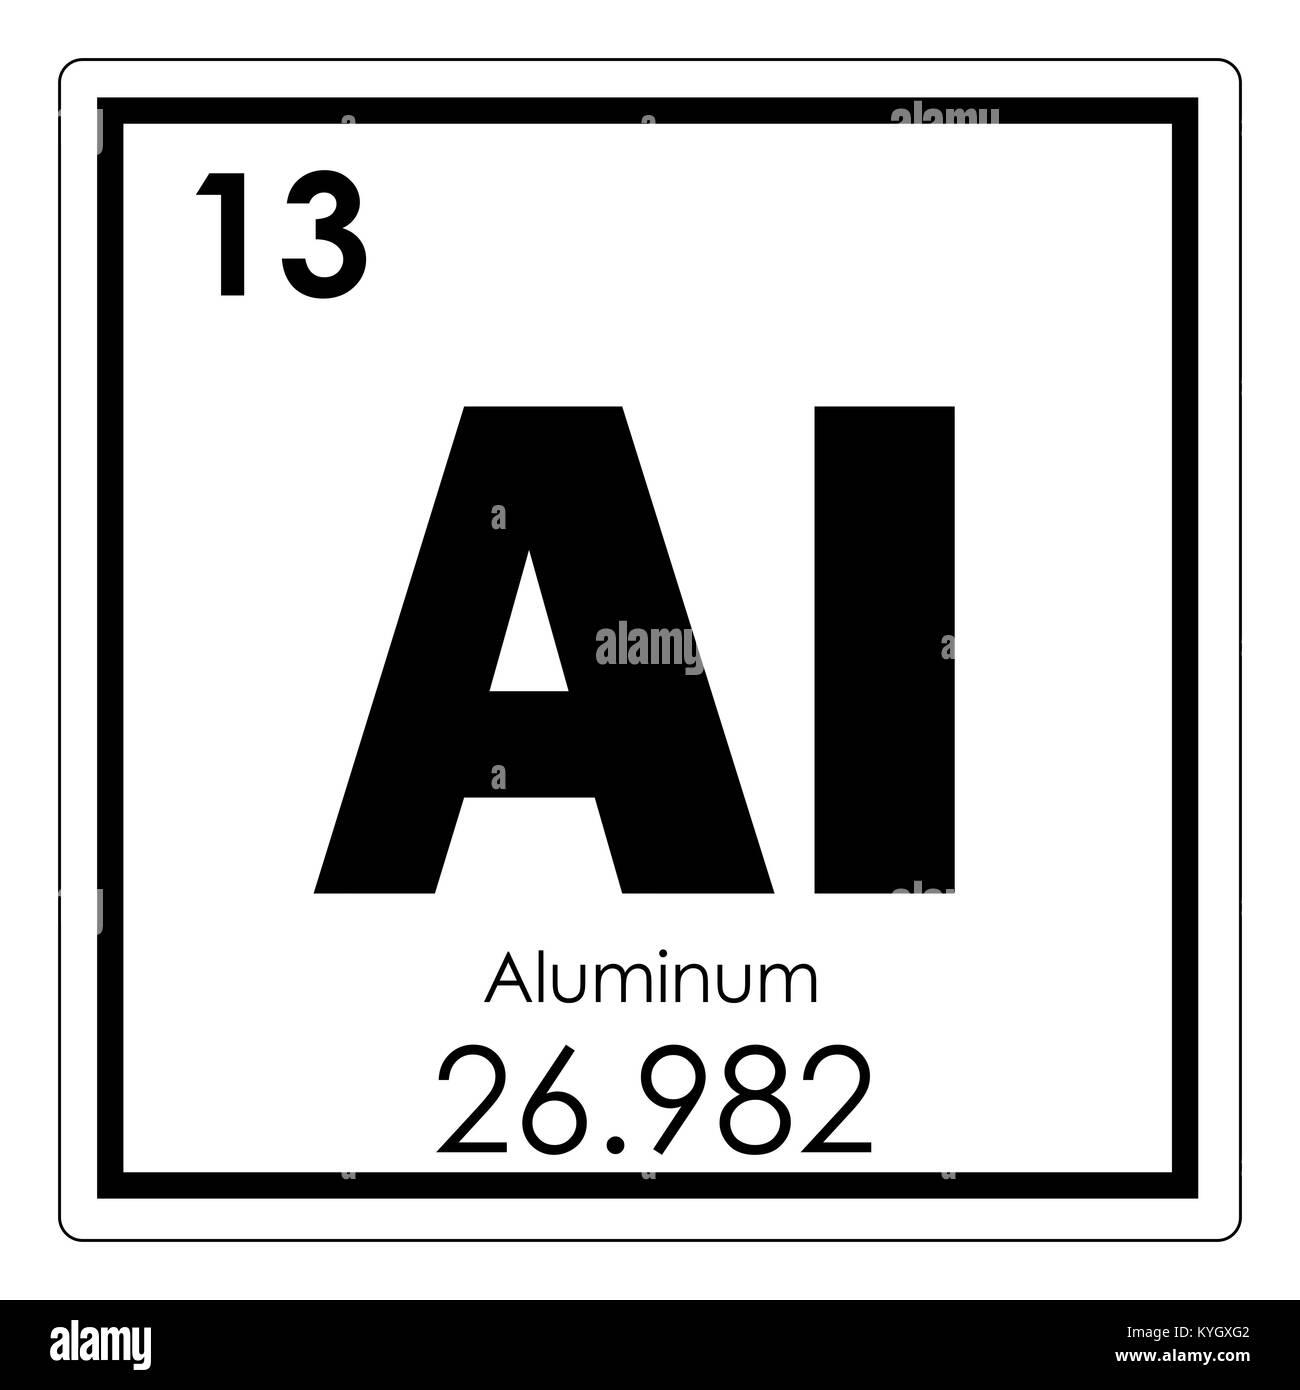 Aluminum Chemical Element Periodic Table Science Symbol Stock Photo